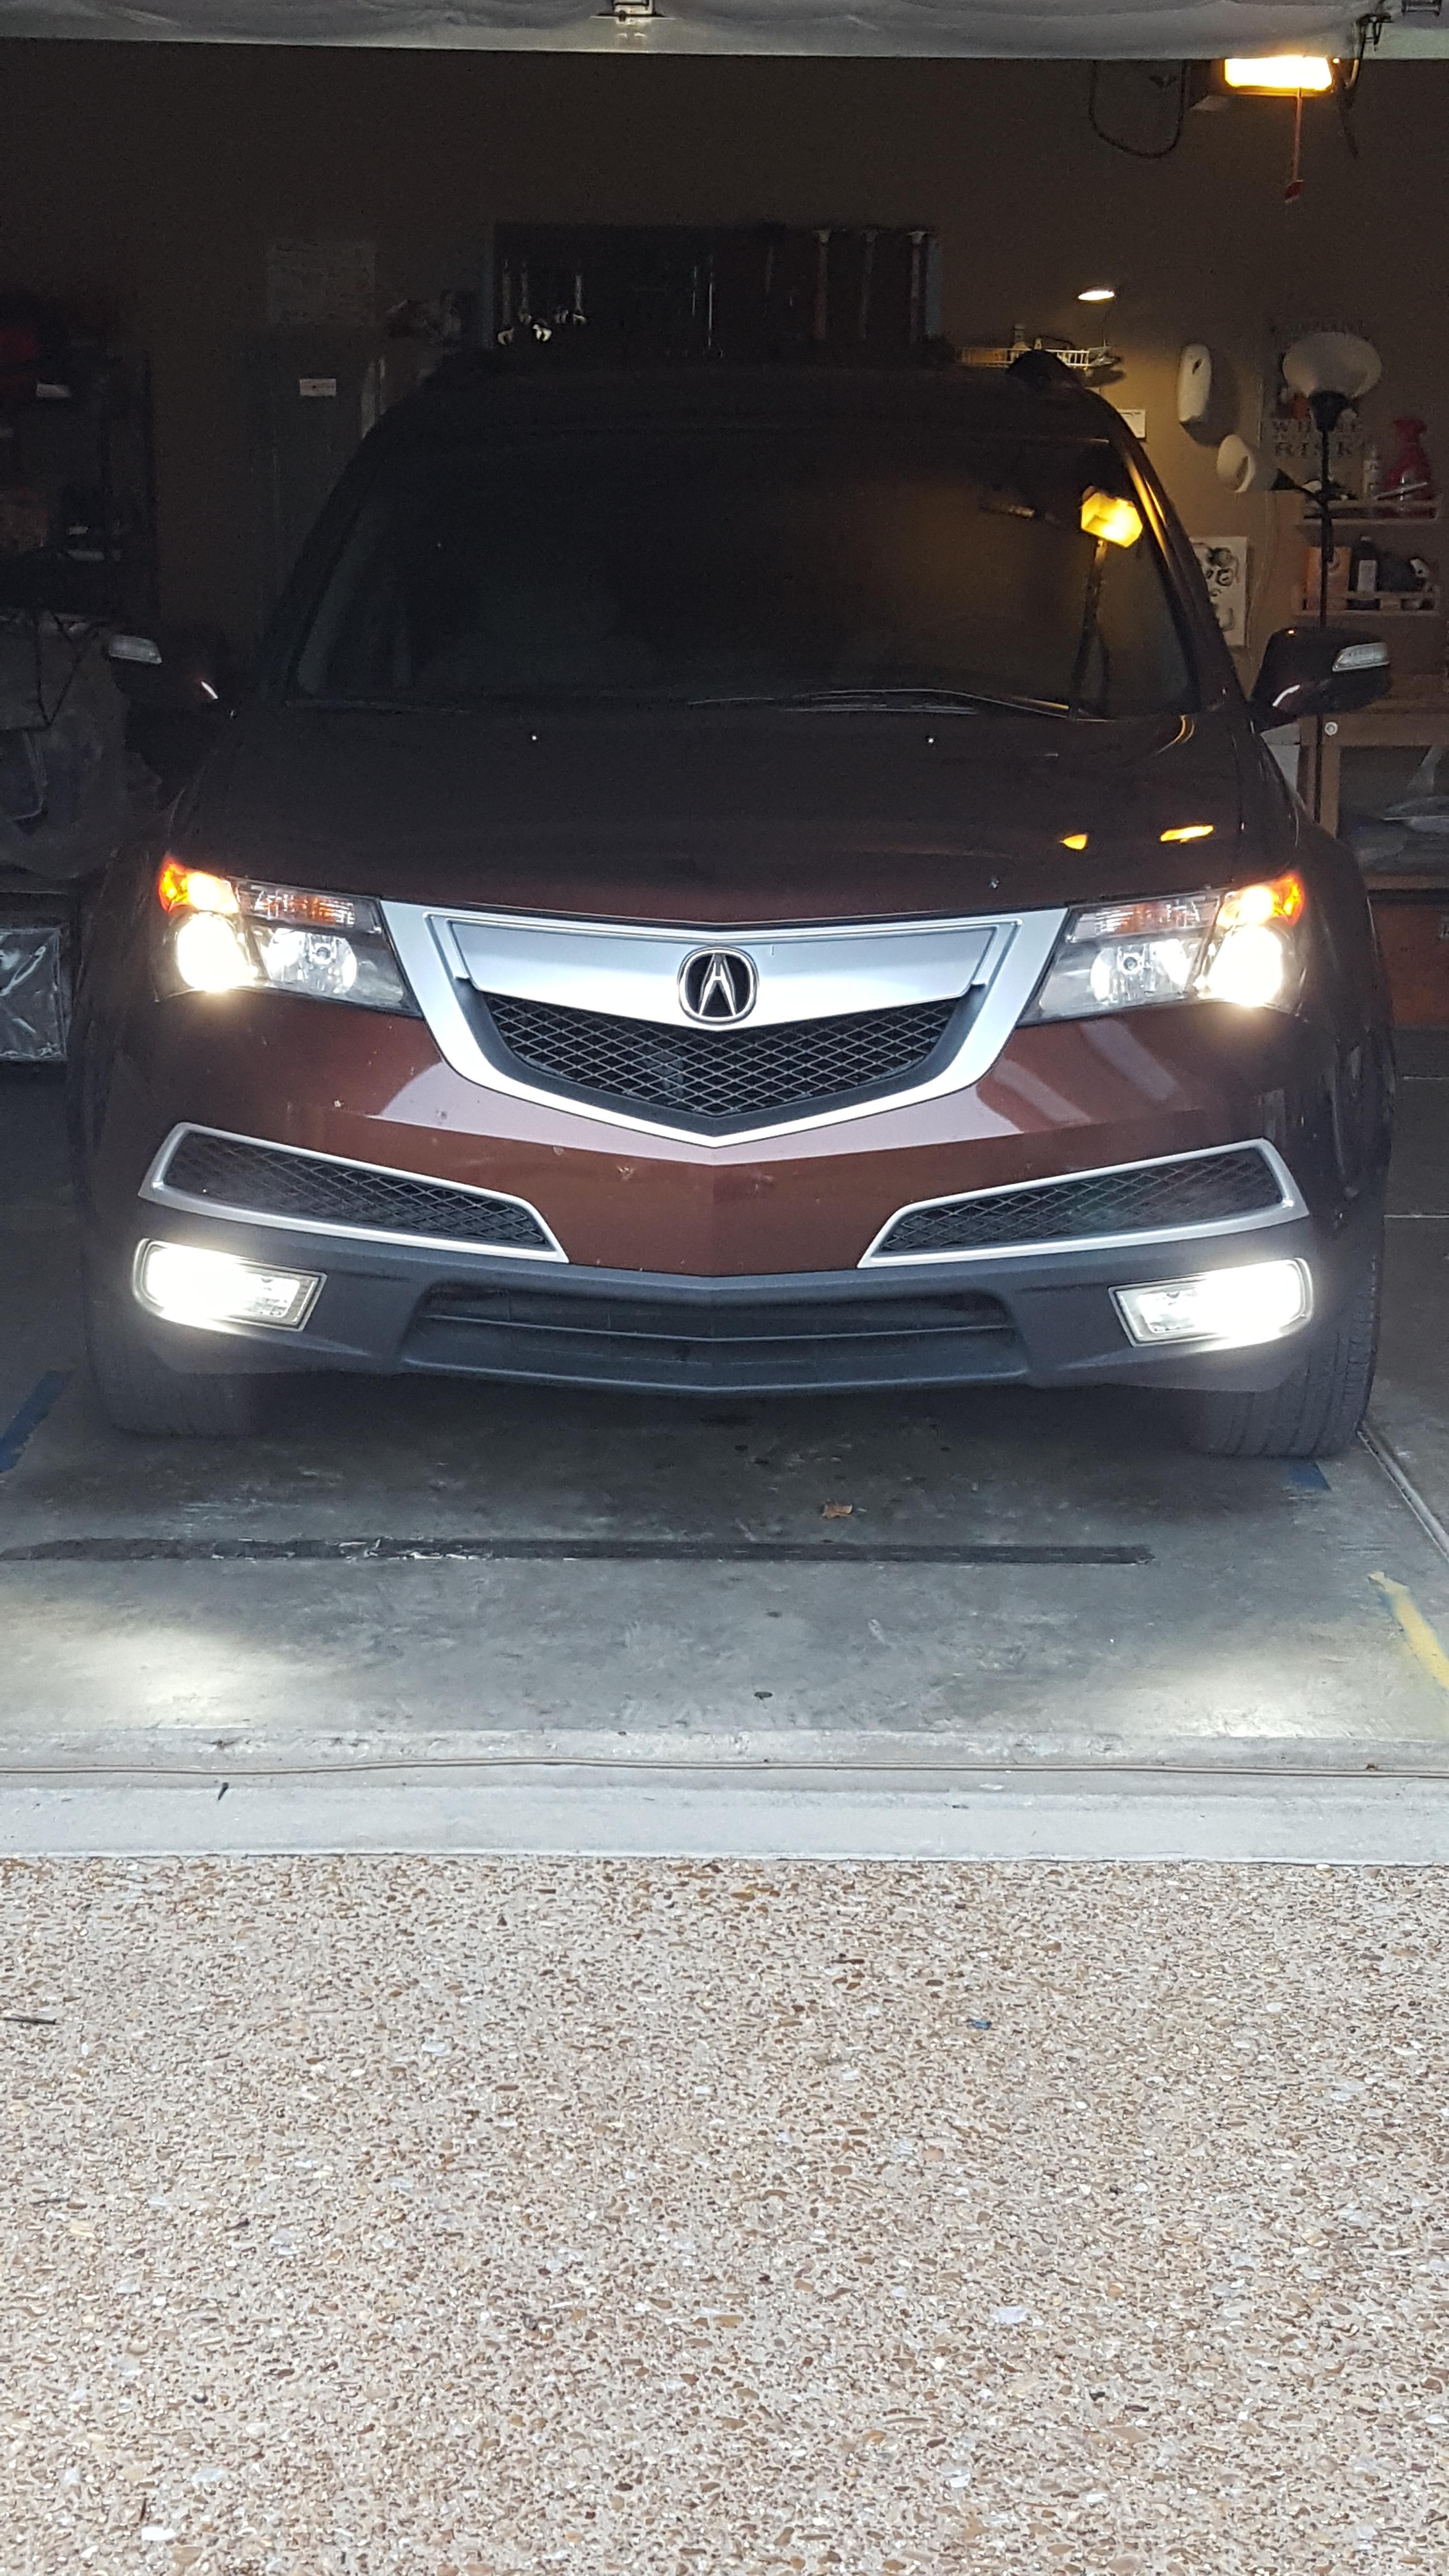 foglight xenon adjustment headlight acura tag and oem headlights right for tl diy hid